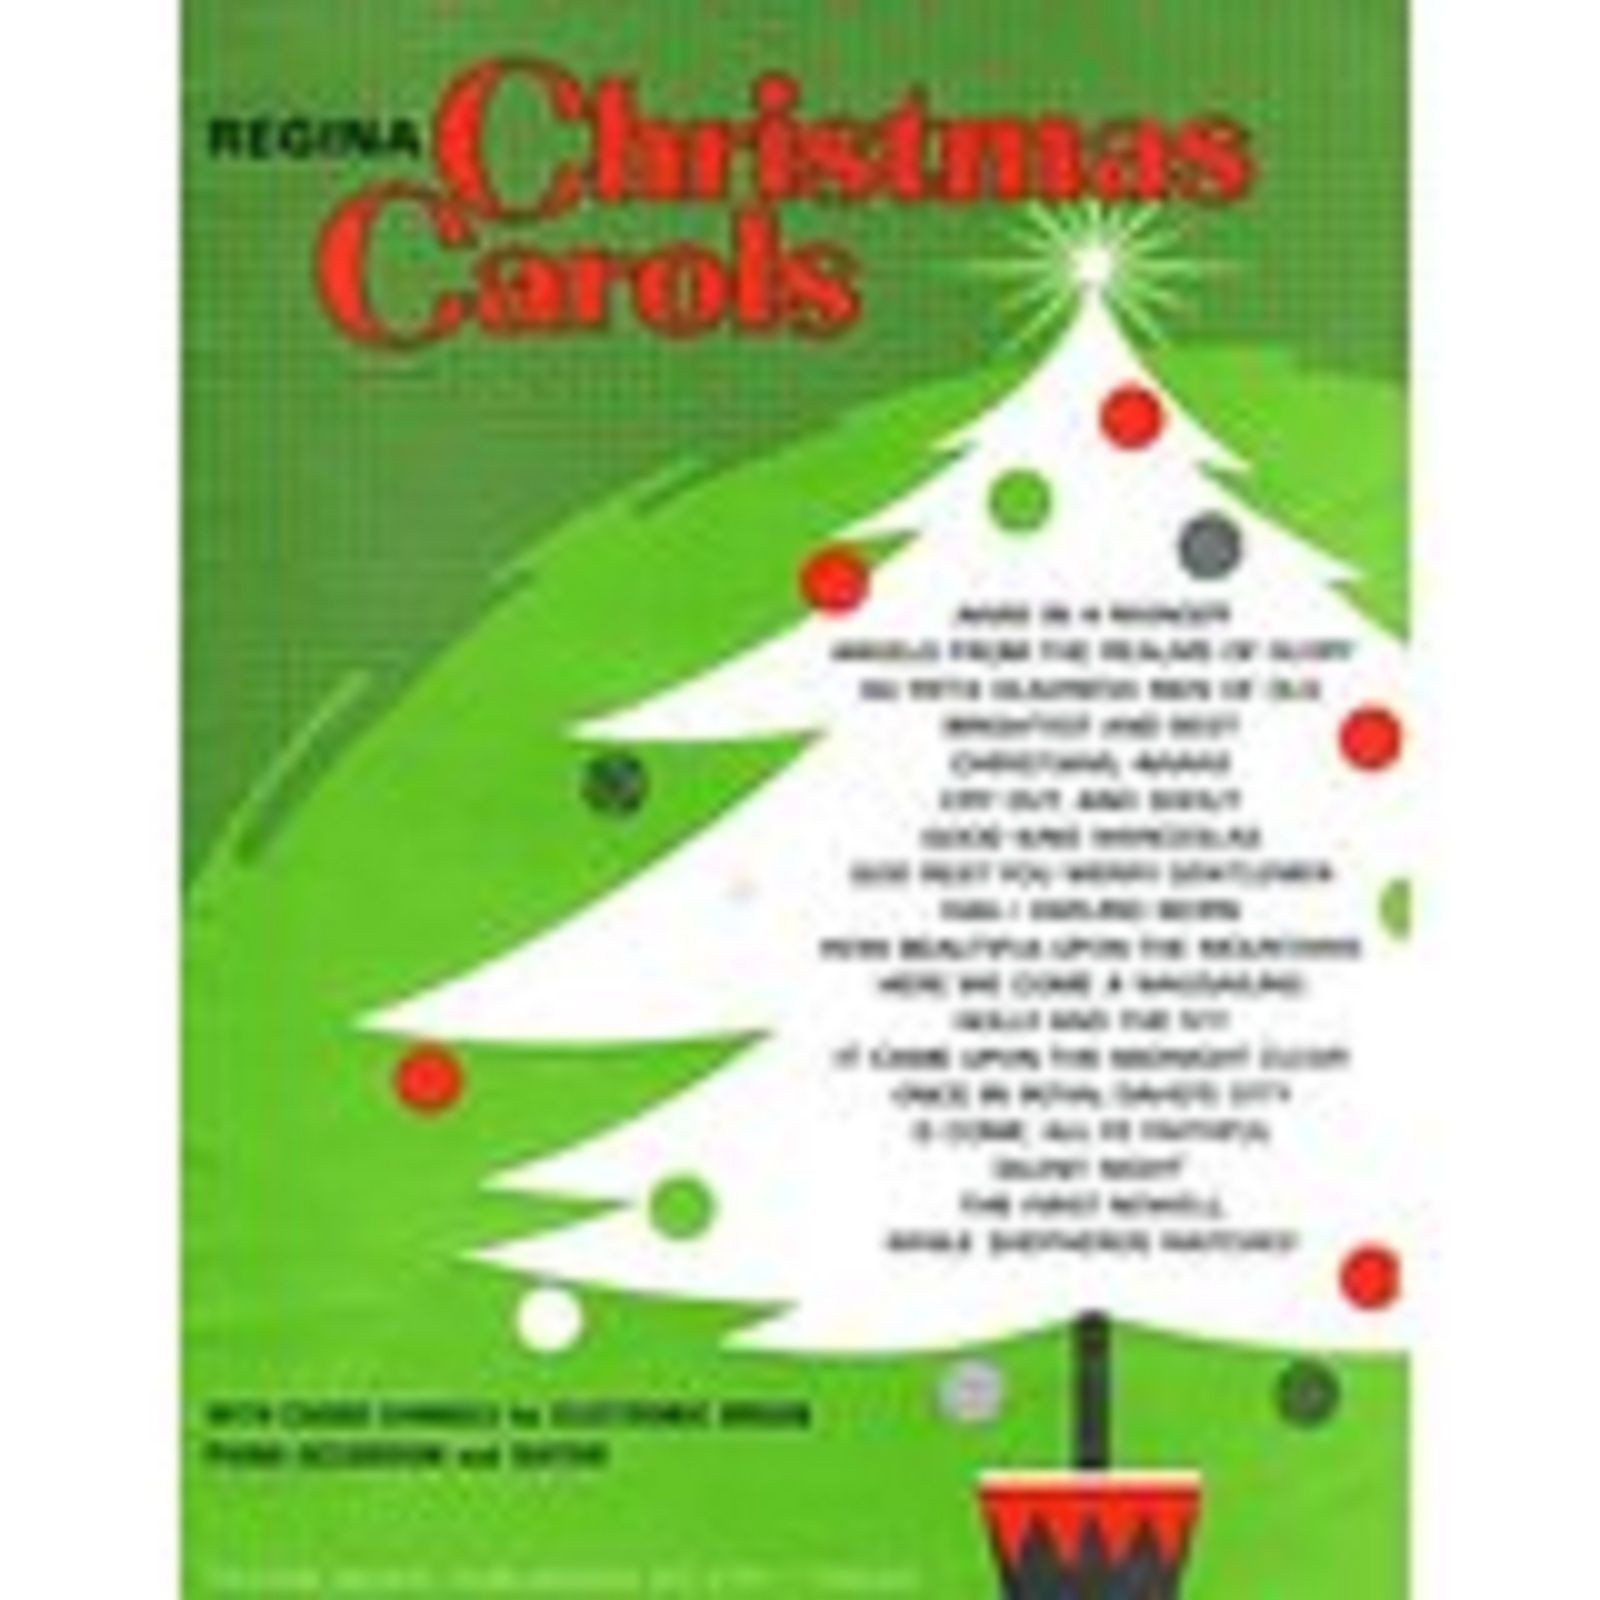 Regina Christmas Carols Trad Easy Sheet Music Songbook Piano Vocal Festive S75